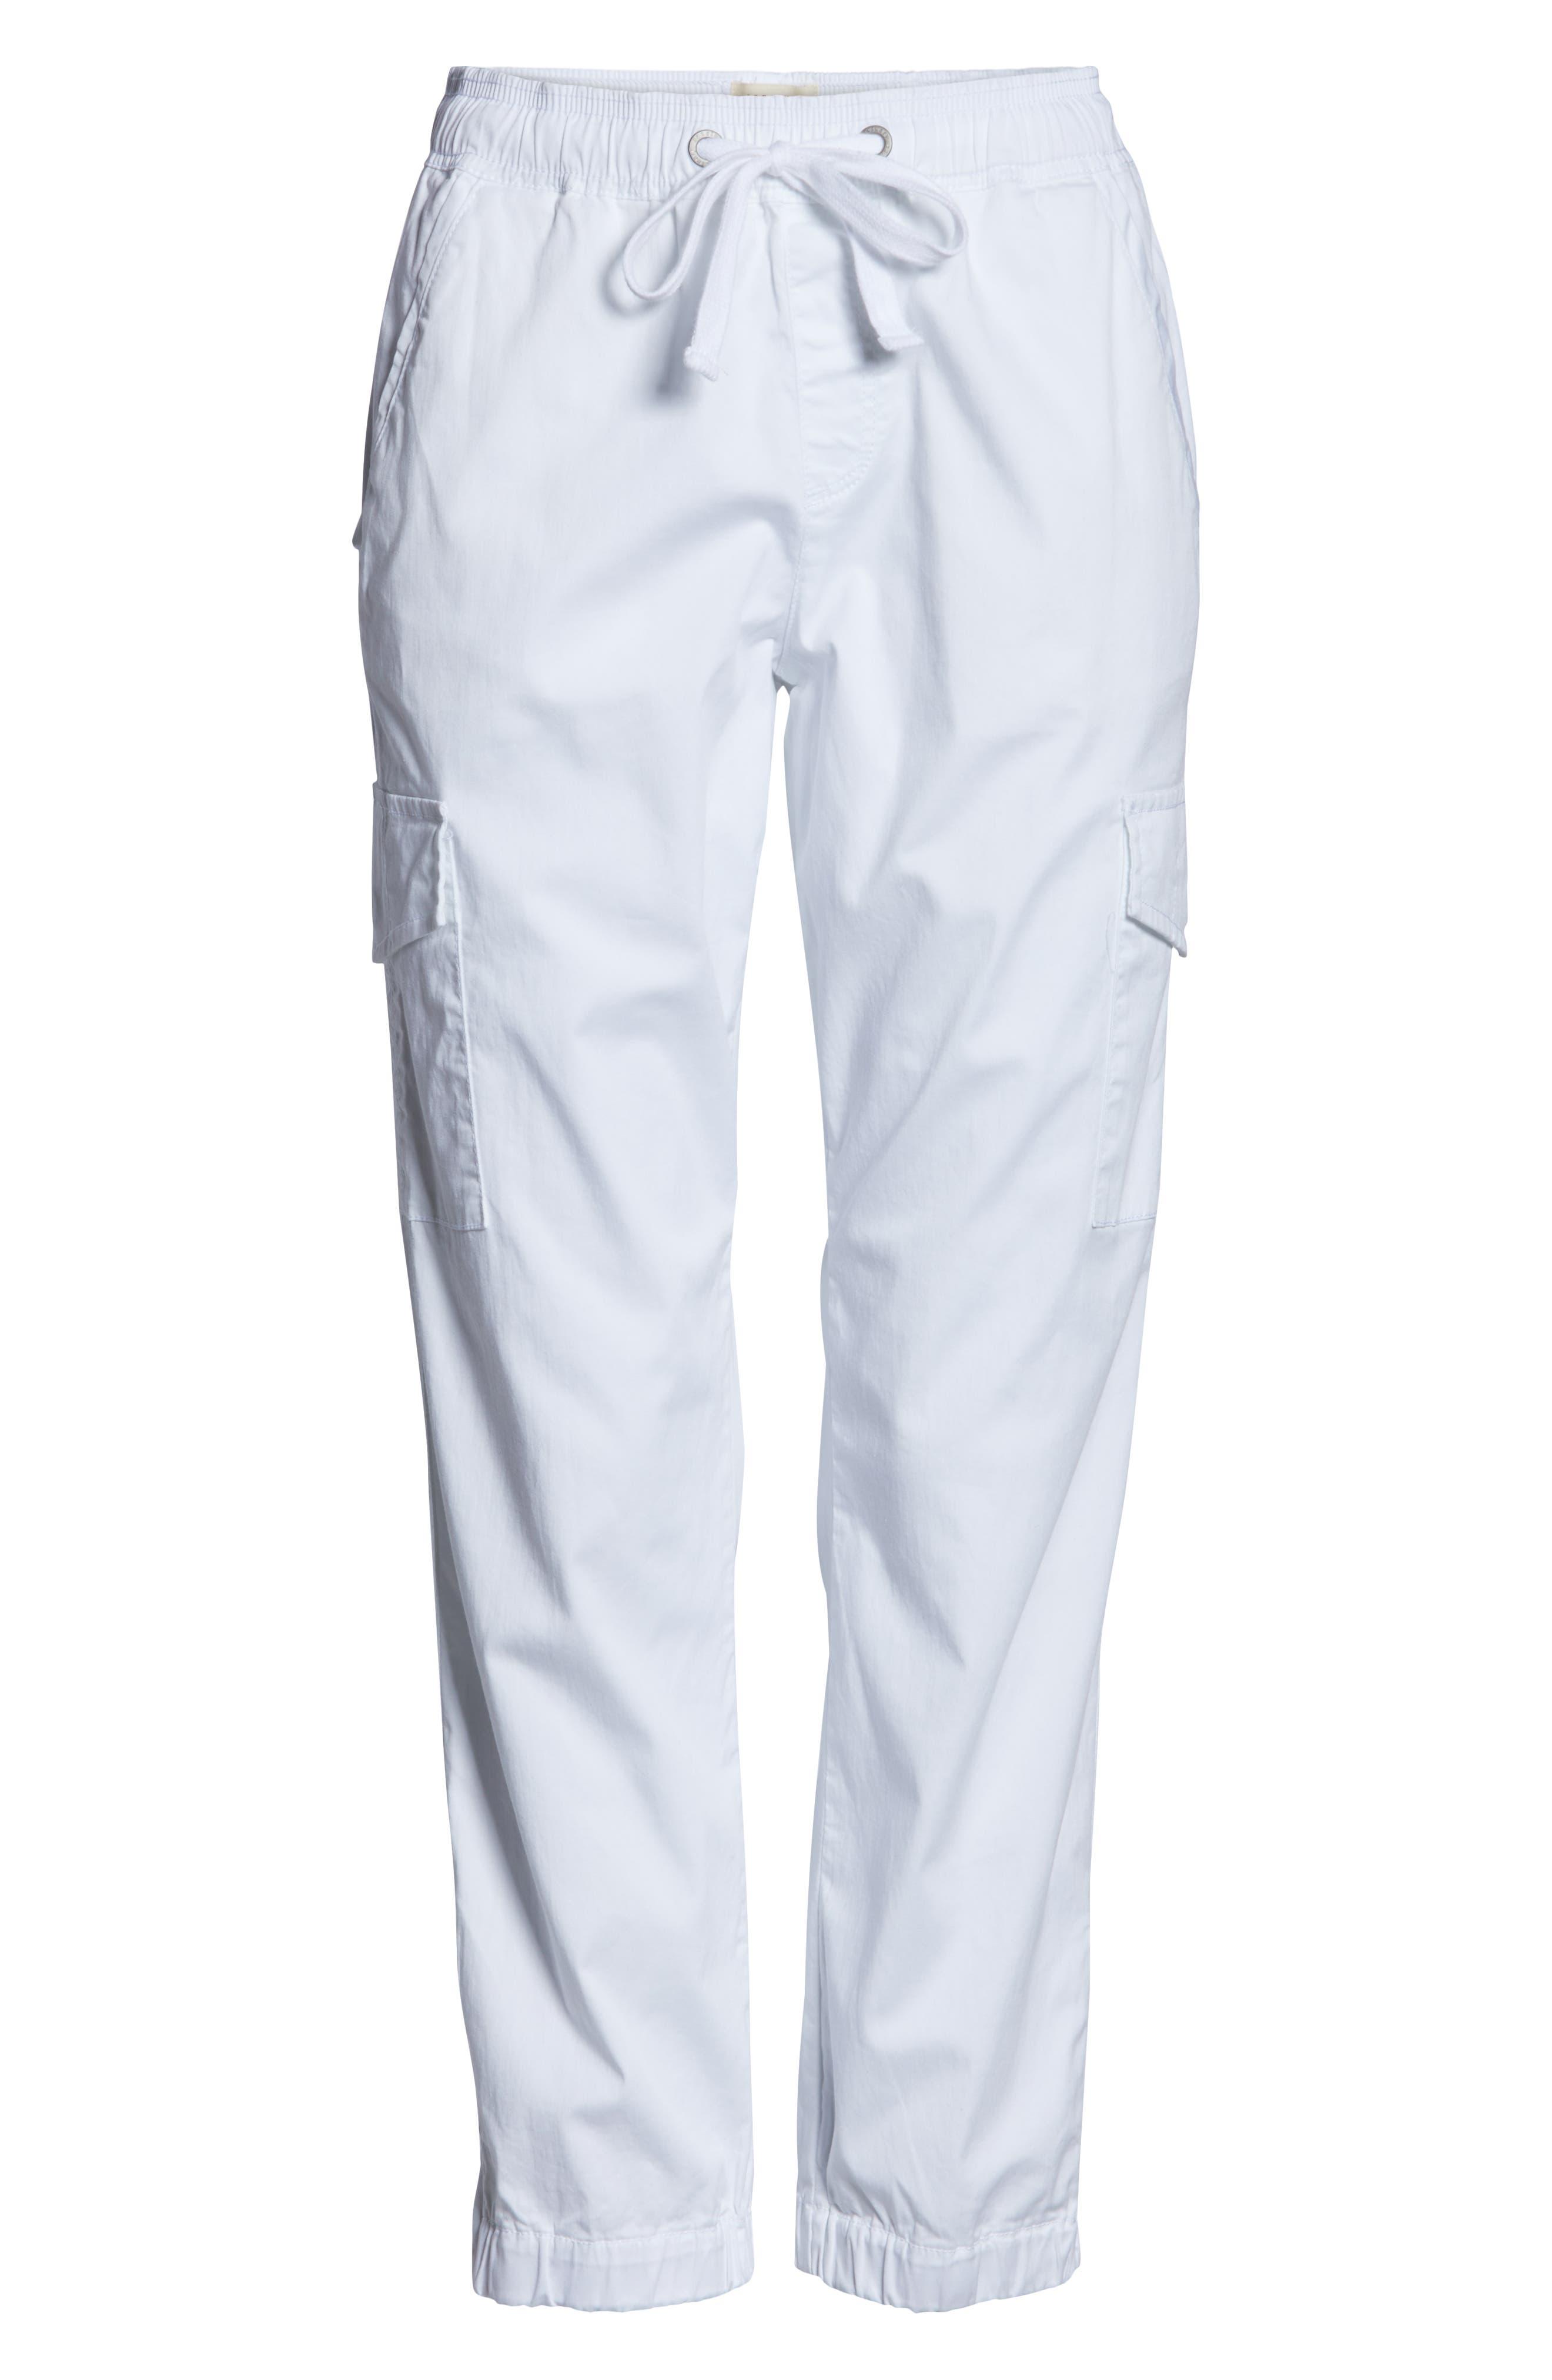 SANCTUARY, Drawstring Trooper Pants, Alternate thumbnail 5, color, BRITE WHITE